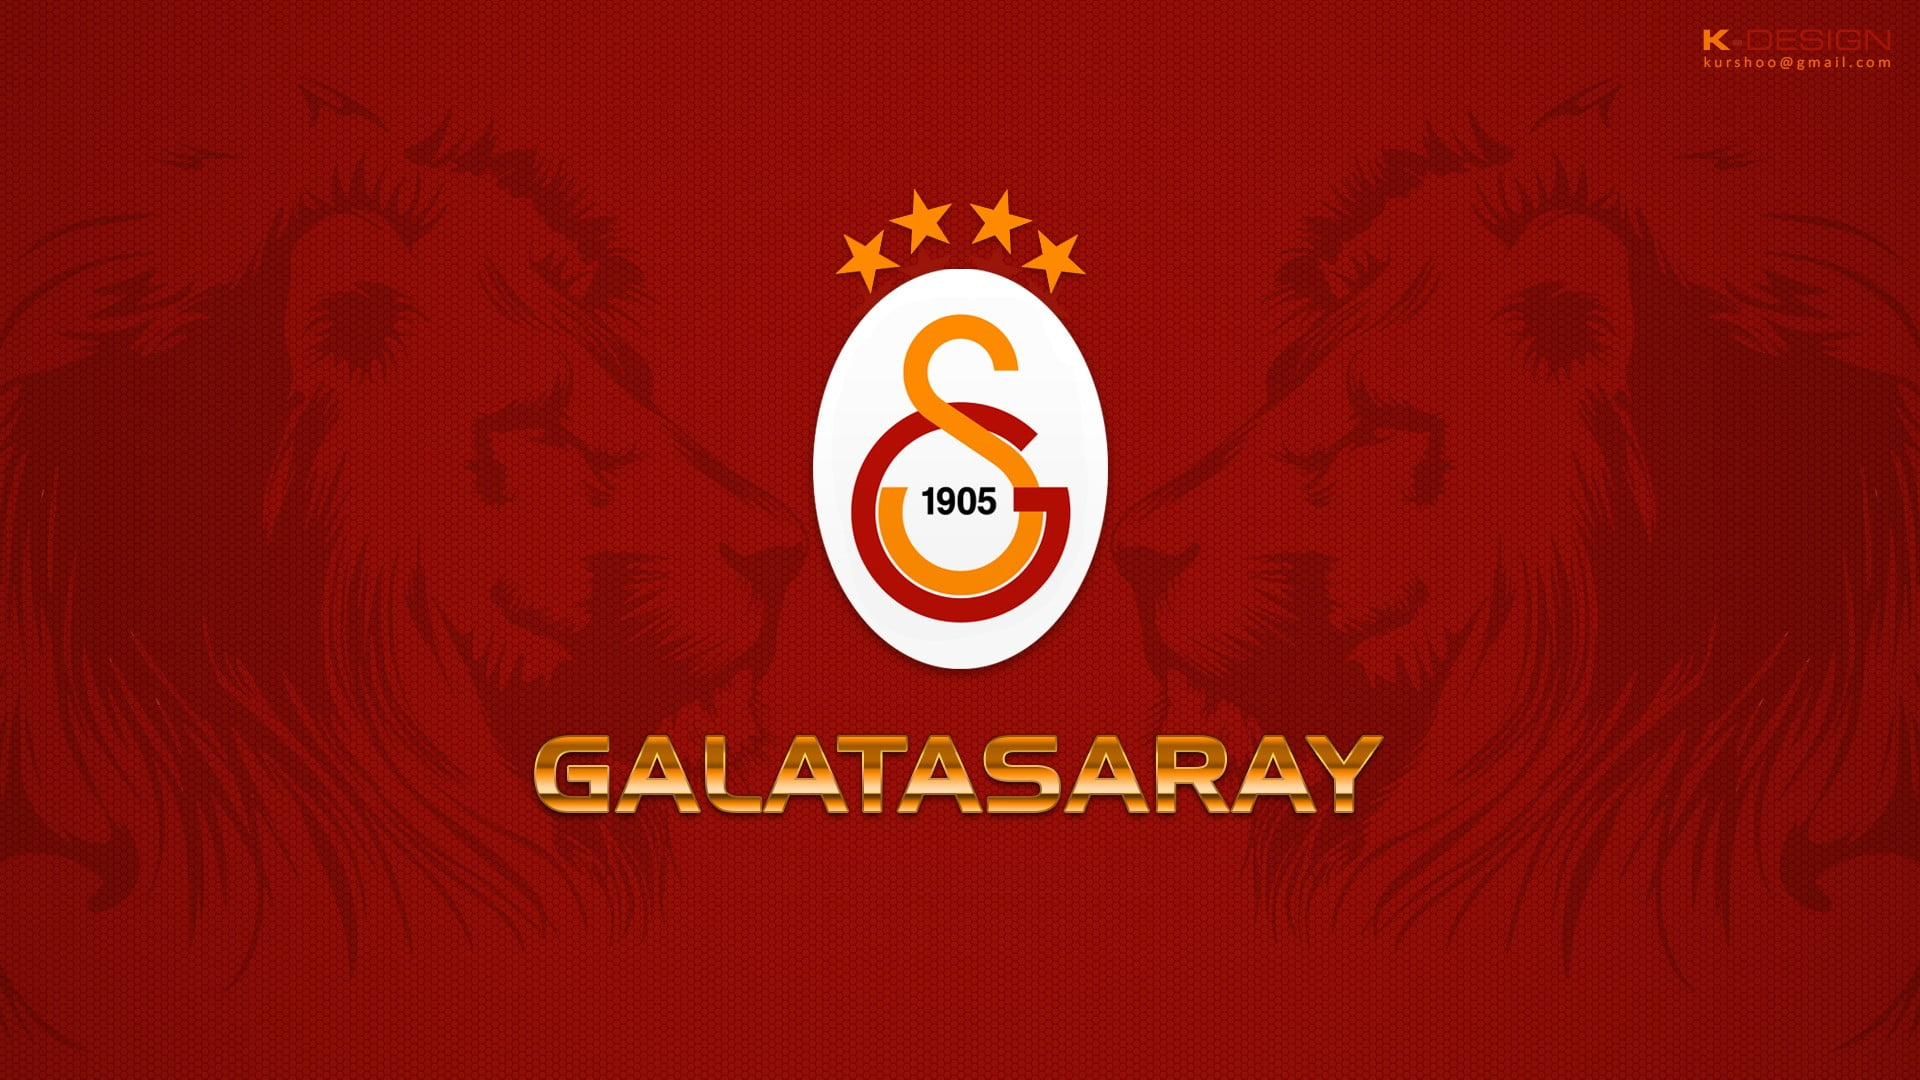 Iphone 2g Wallpaper For Iphone X Galatasaray Logo Hd Wallpaper Wallpaper Flare